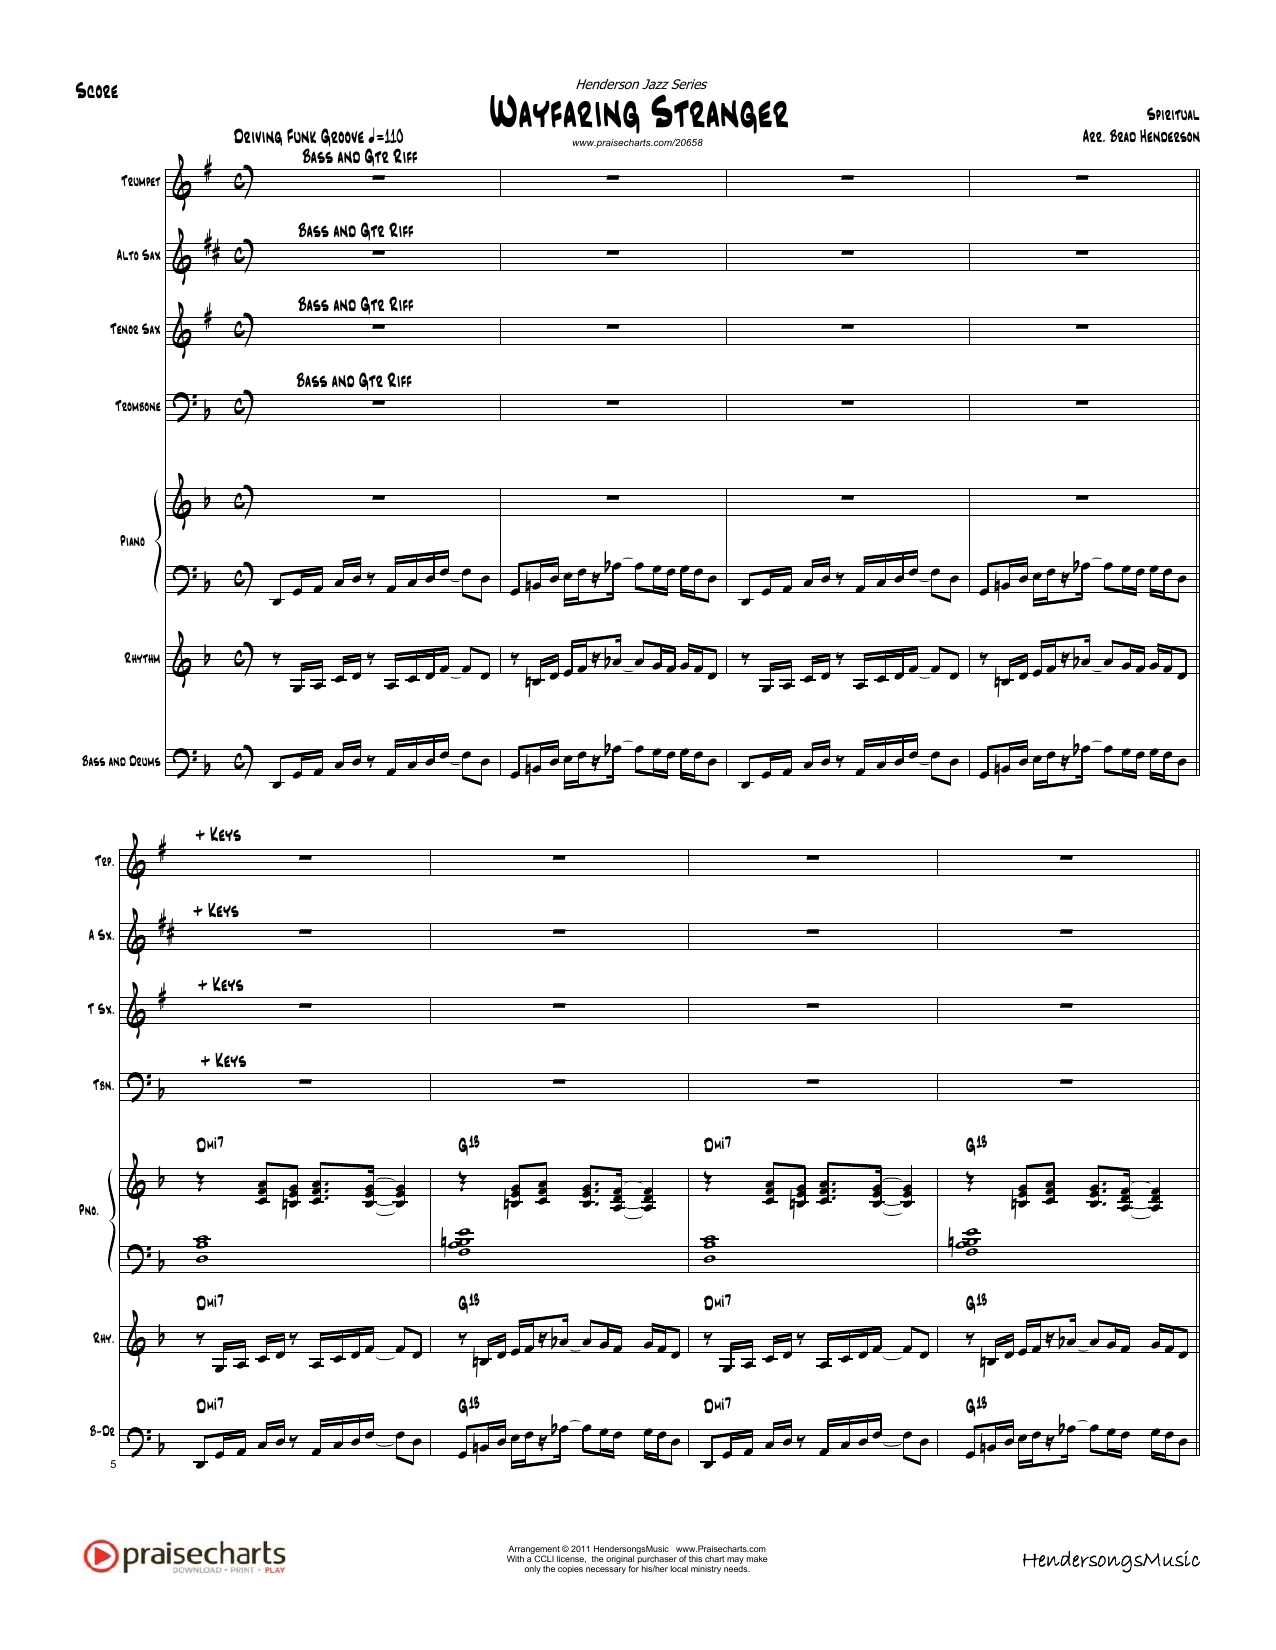 Wayfaring Stranger - Orchestration